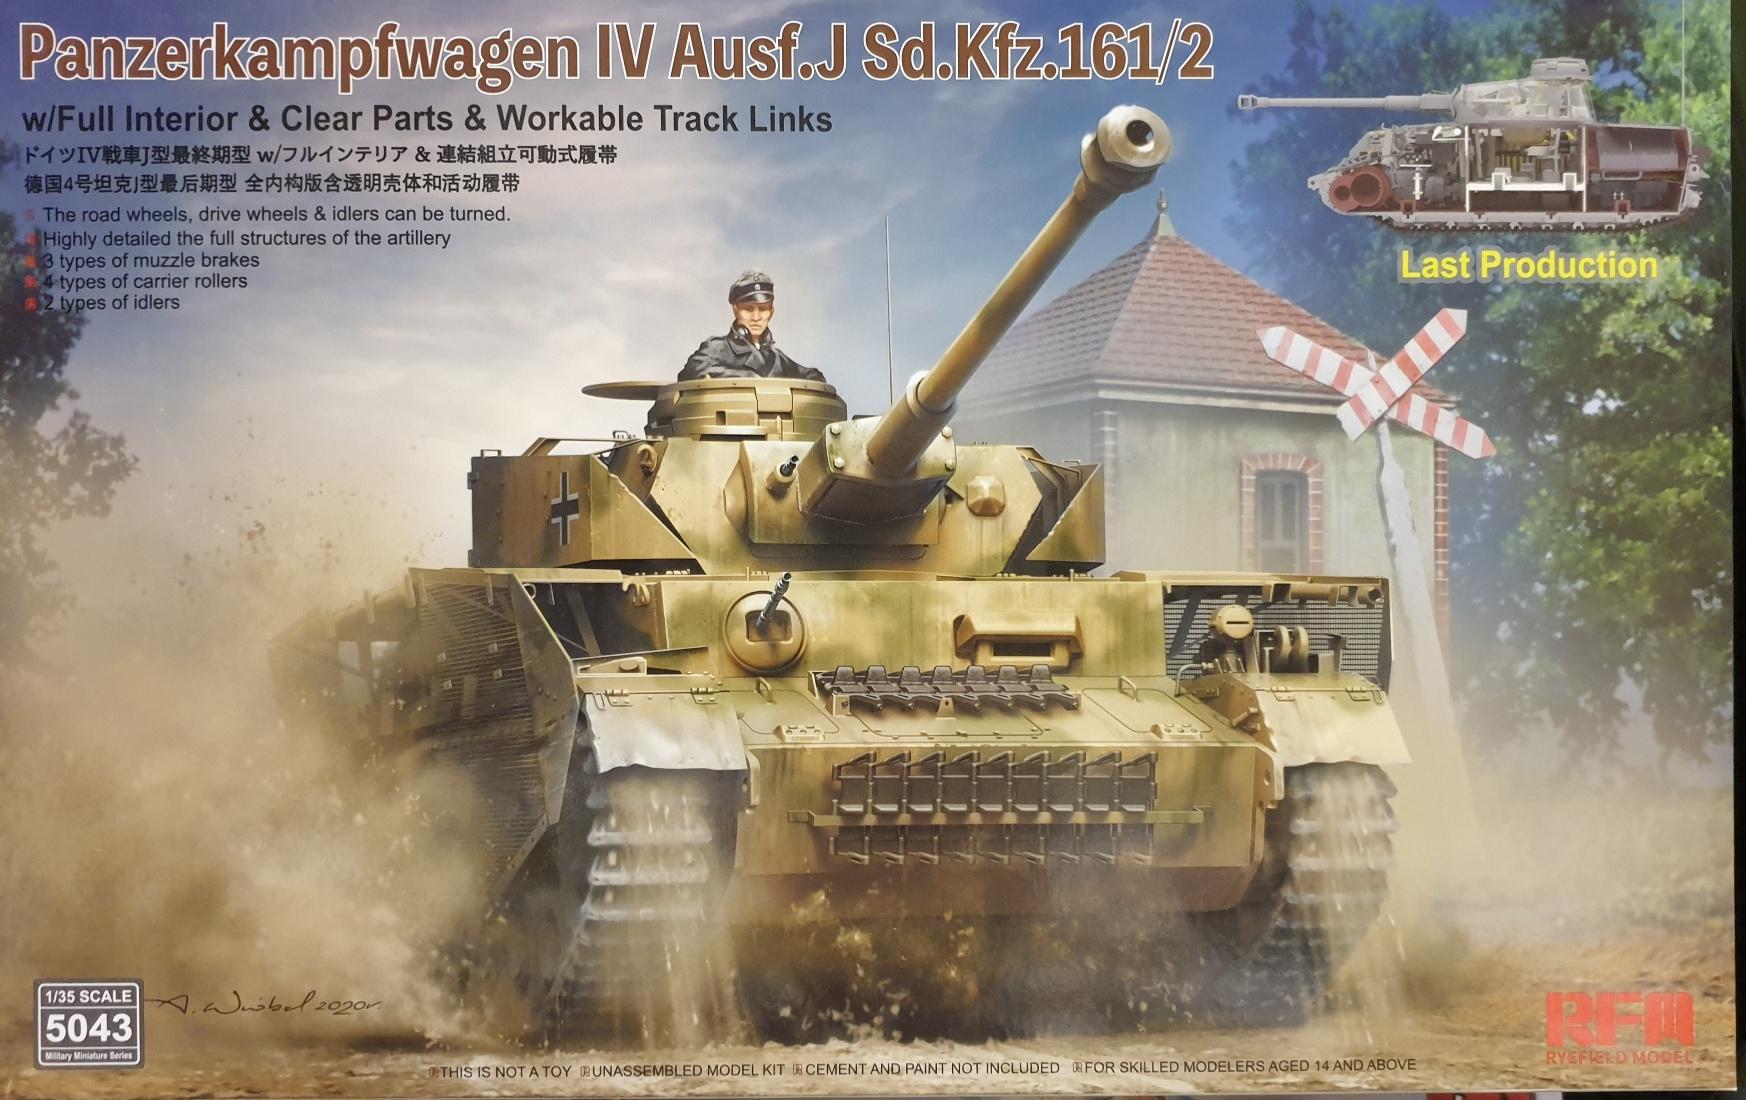 02 Rye Field Model 5043 Panzerkampfwagen IV Ausf. J Sd.Kfz. 161/2 w/ full interior 1/35